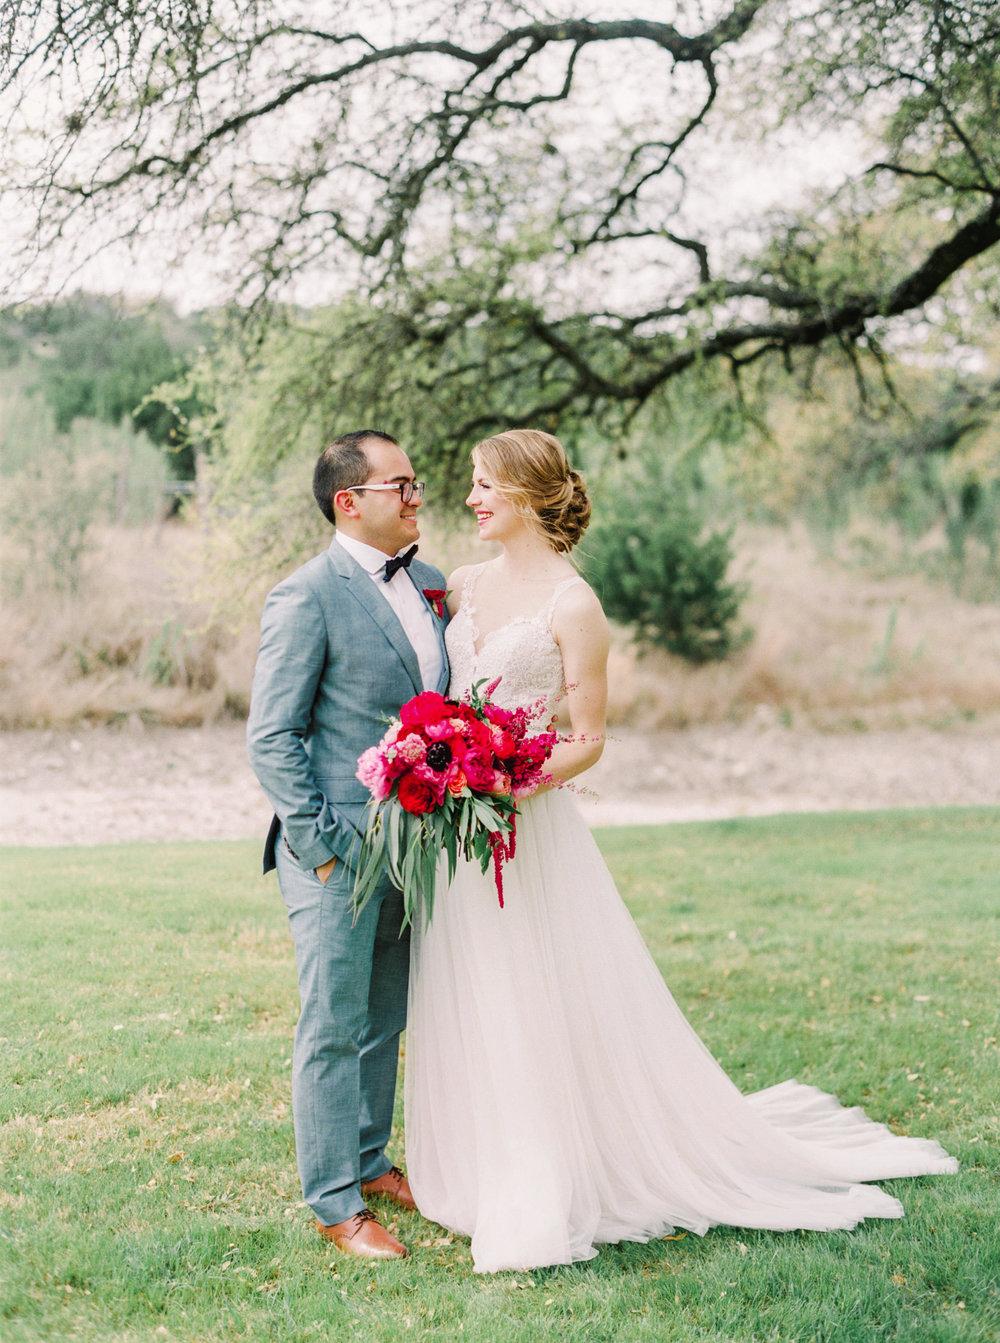 The-Creek-Haus-Wedding-Dripping-Springs-62.jpg